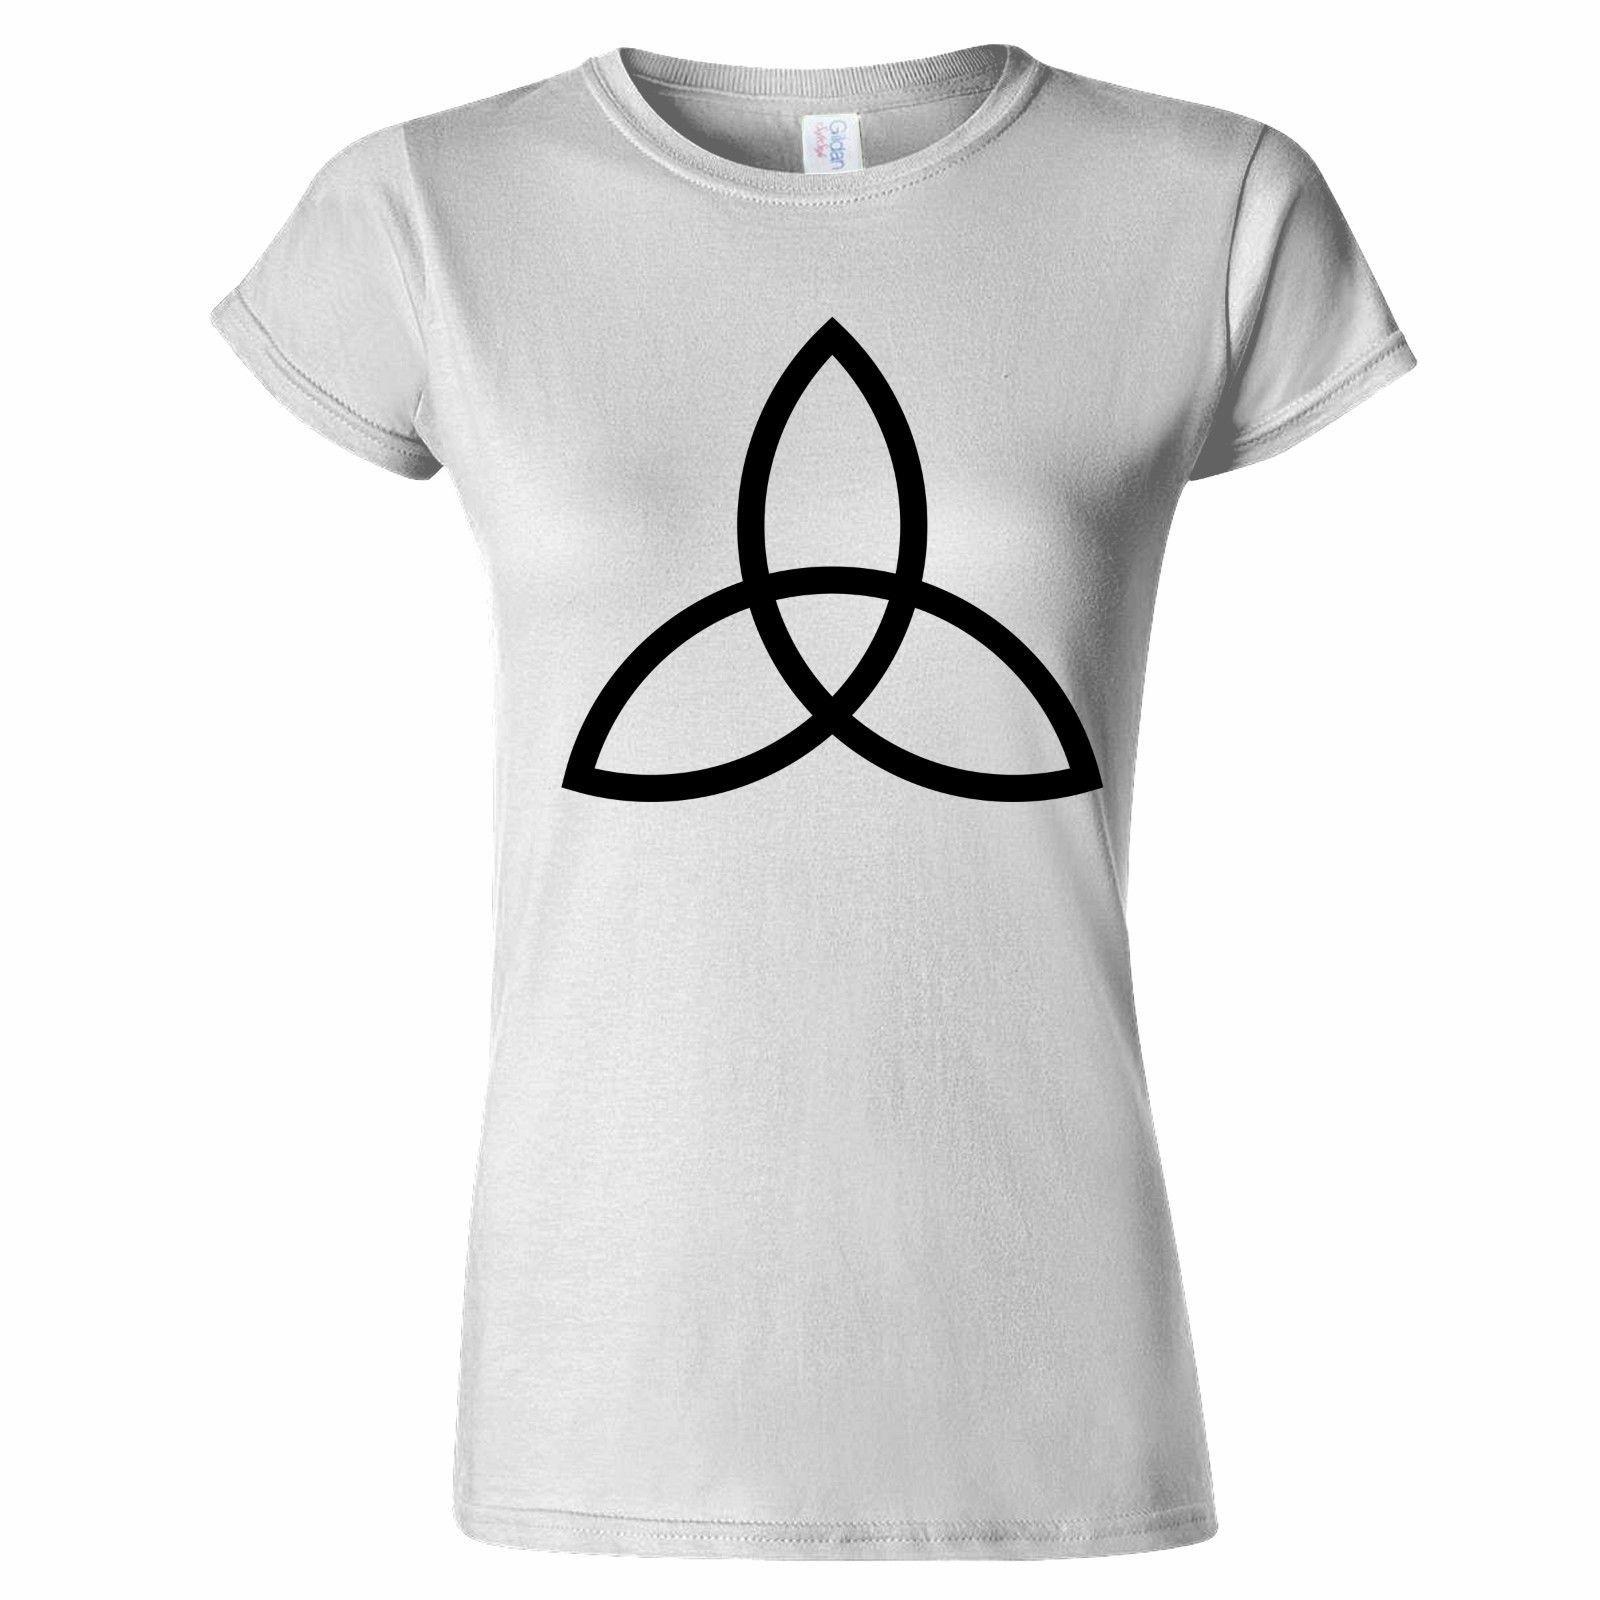 Femme Symbol Pagan Triad T Acheter Shirt Religion Triquetra Celtic VpSMUz